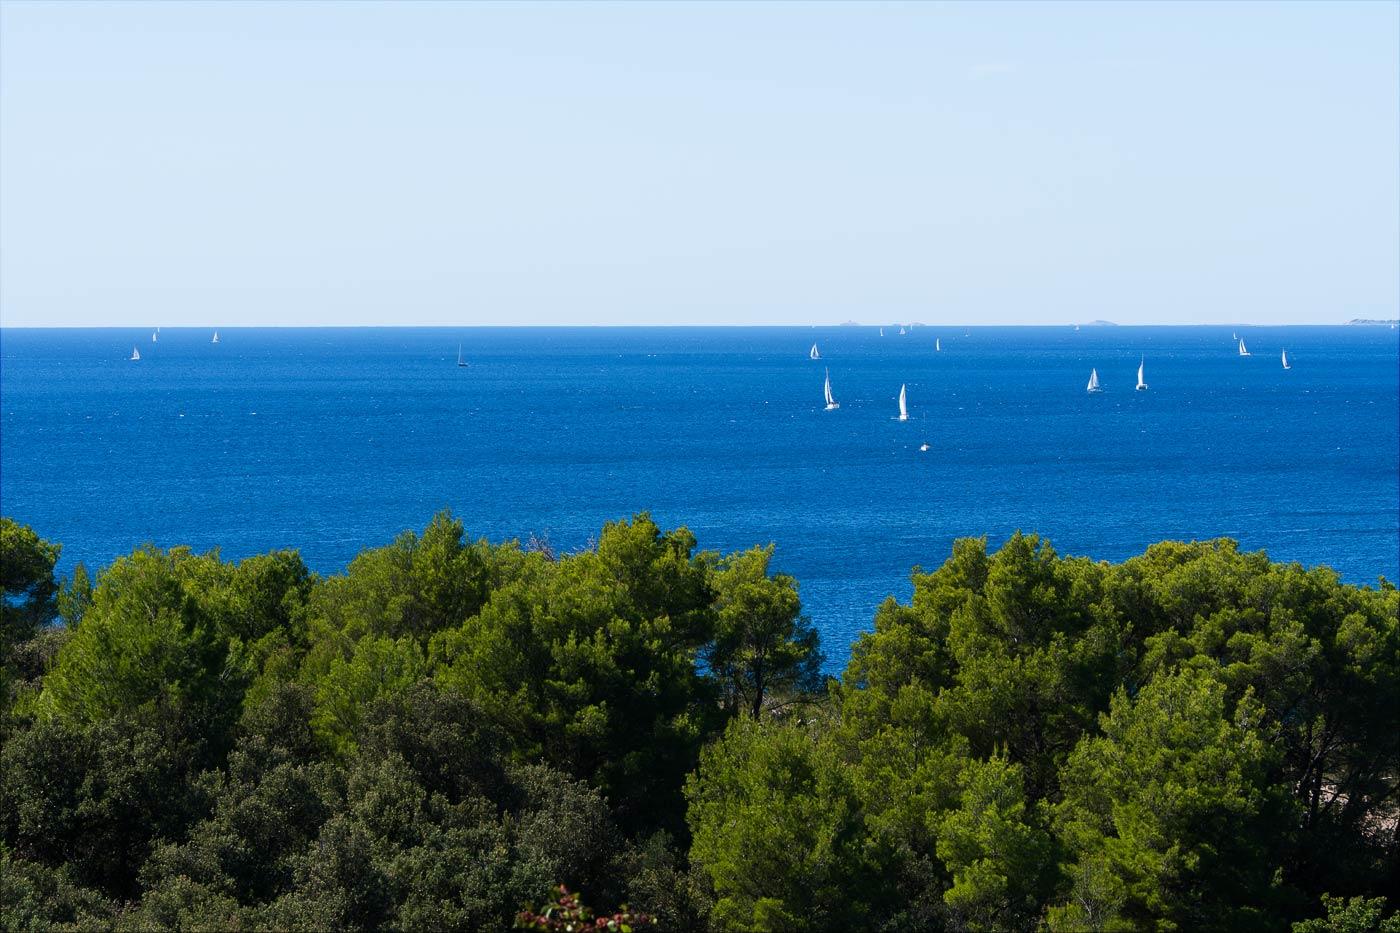 Яхты в море. Примоштен, Хорватия